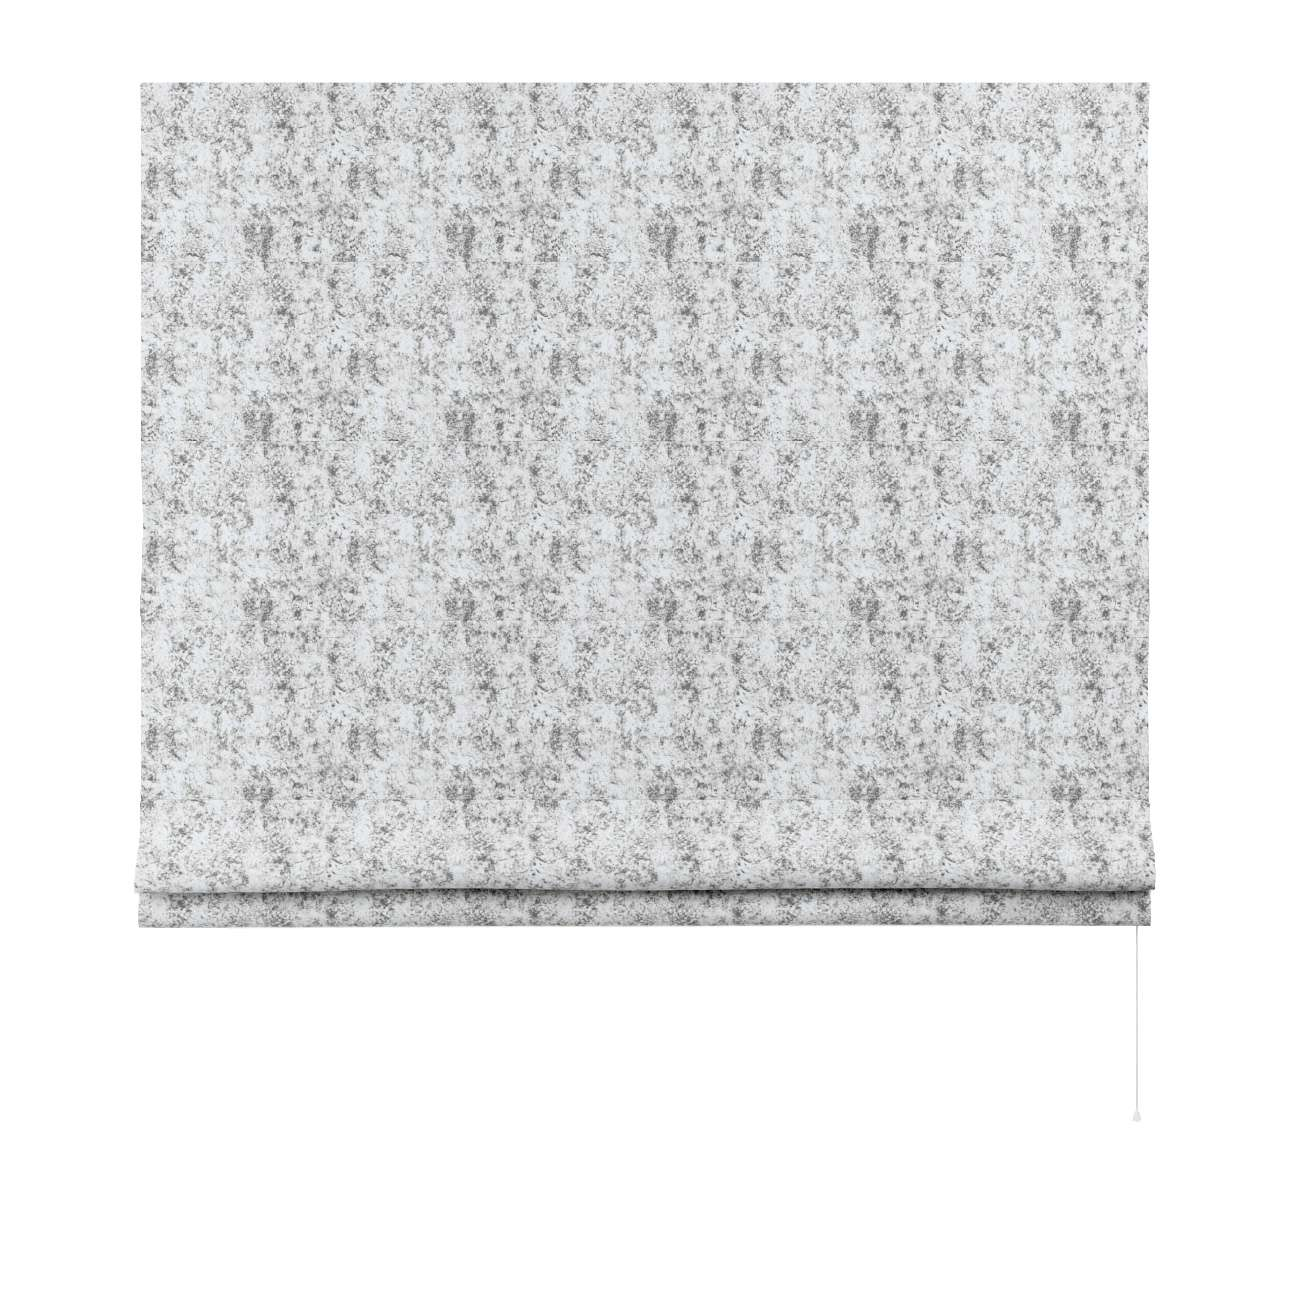 Rímska roleta Capri V kolekcii Velvet, tkanina: 704-49